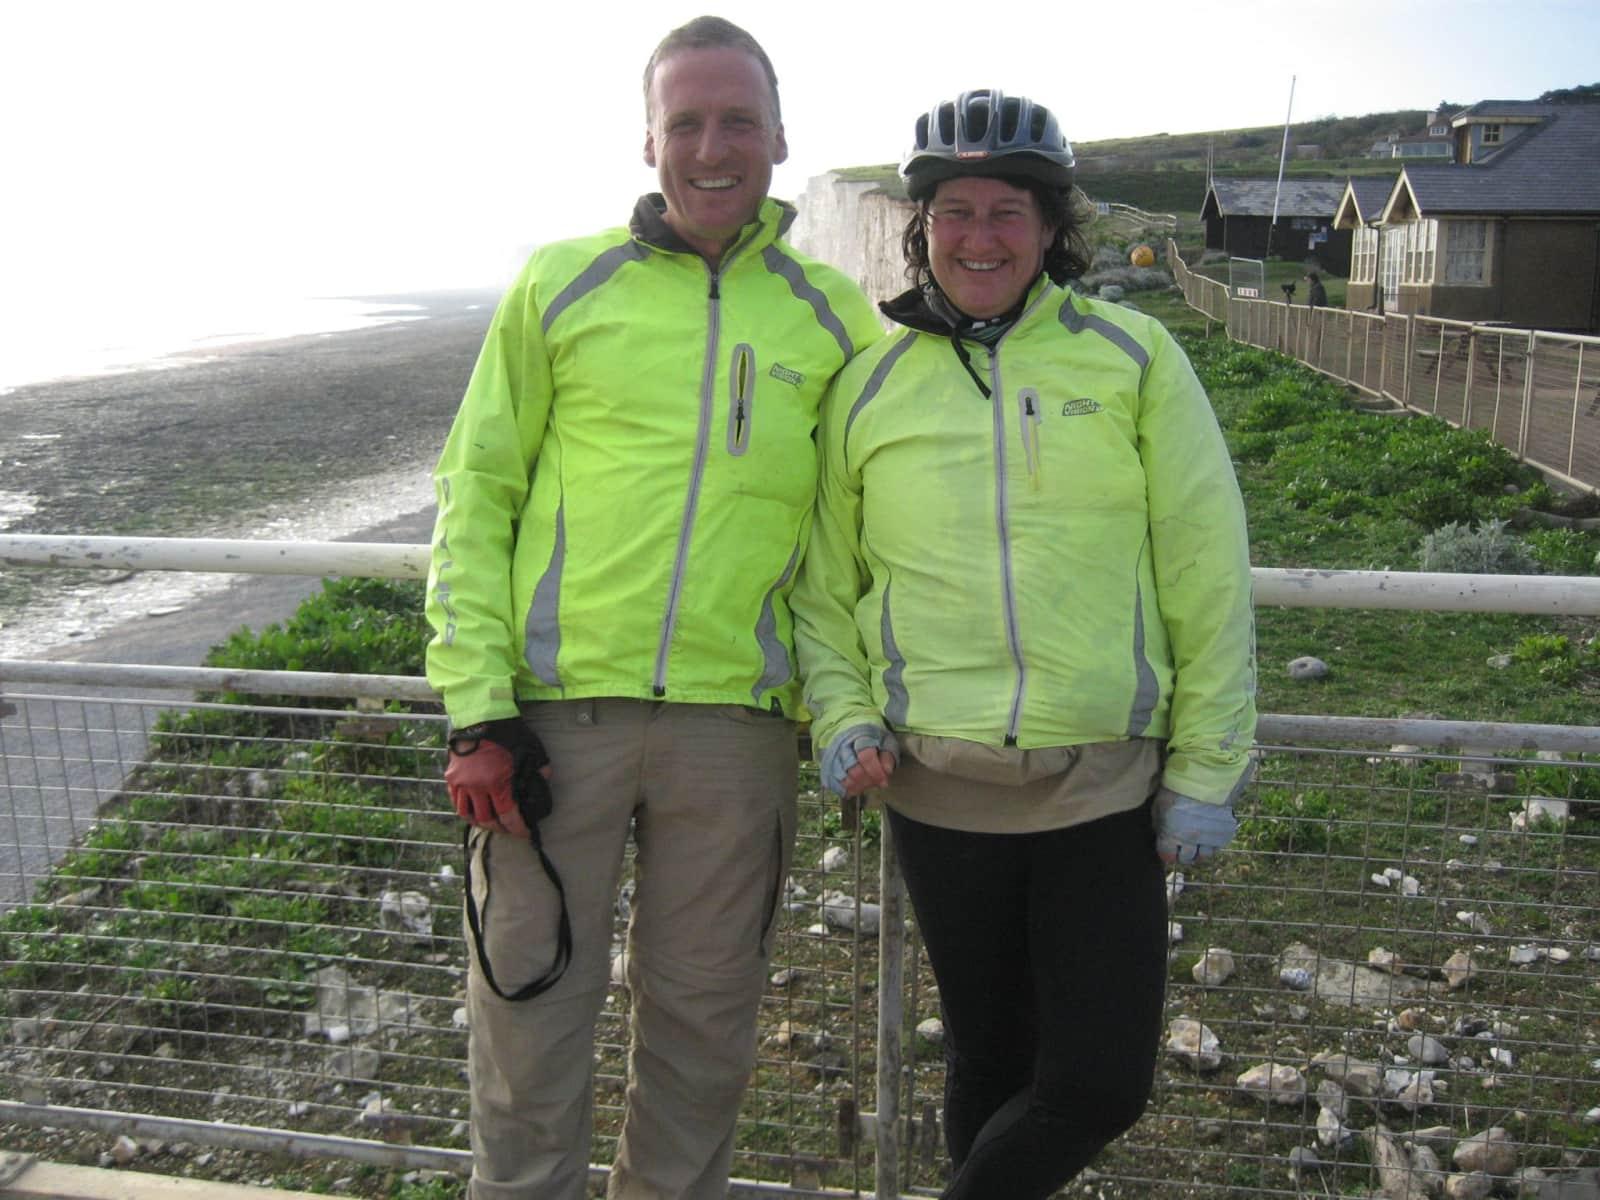 Jo & Ric from Dawlish, United Kingdom